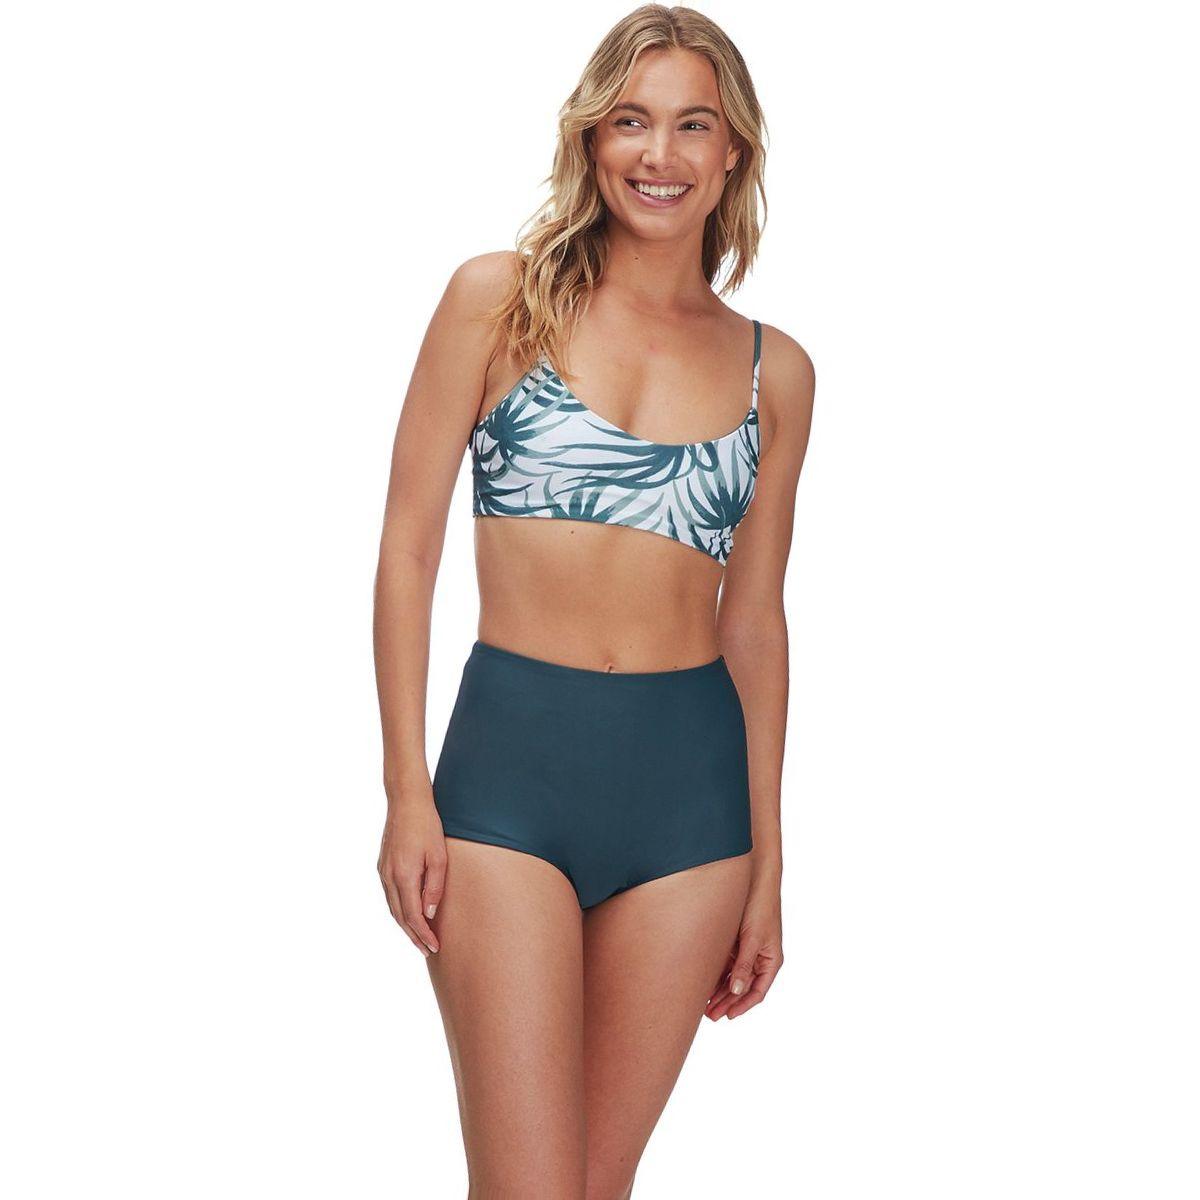 MIKOH Menehune Bikini Bottom - Women's